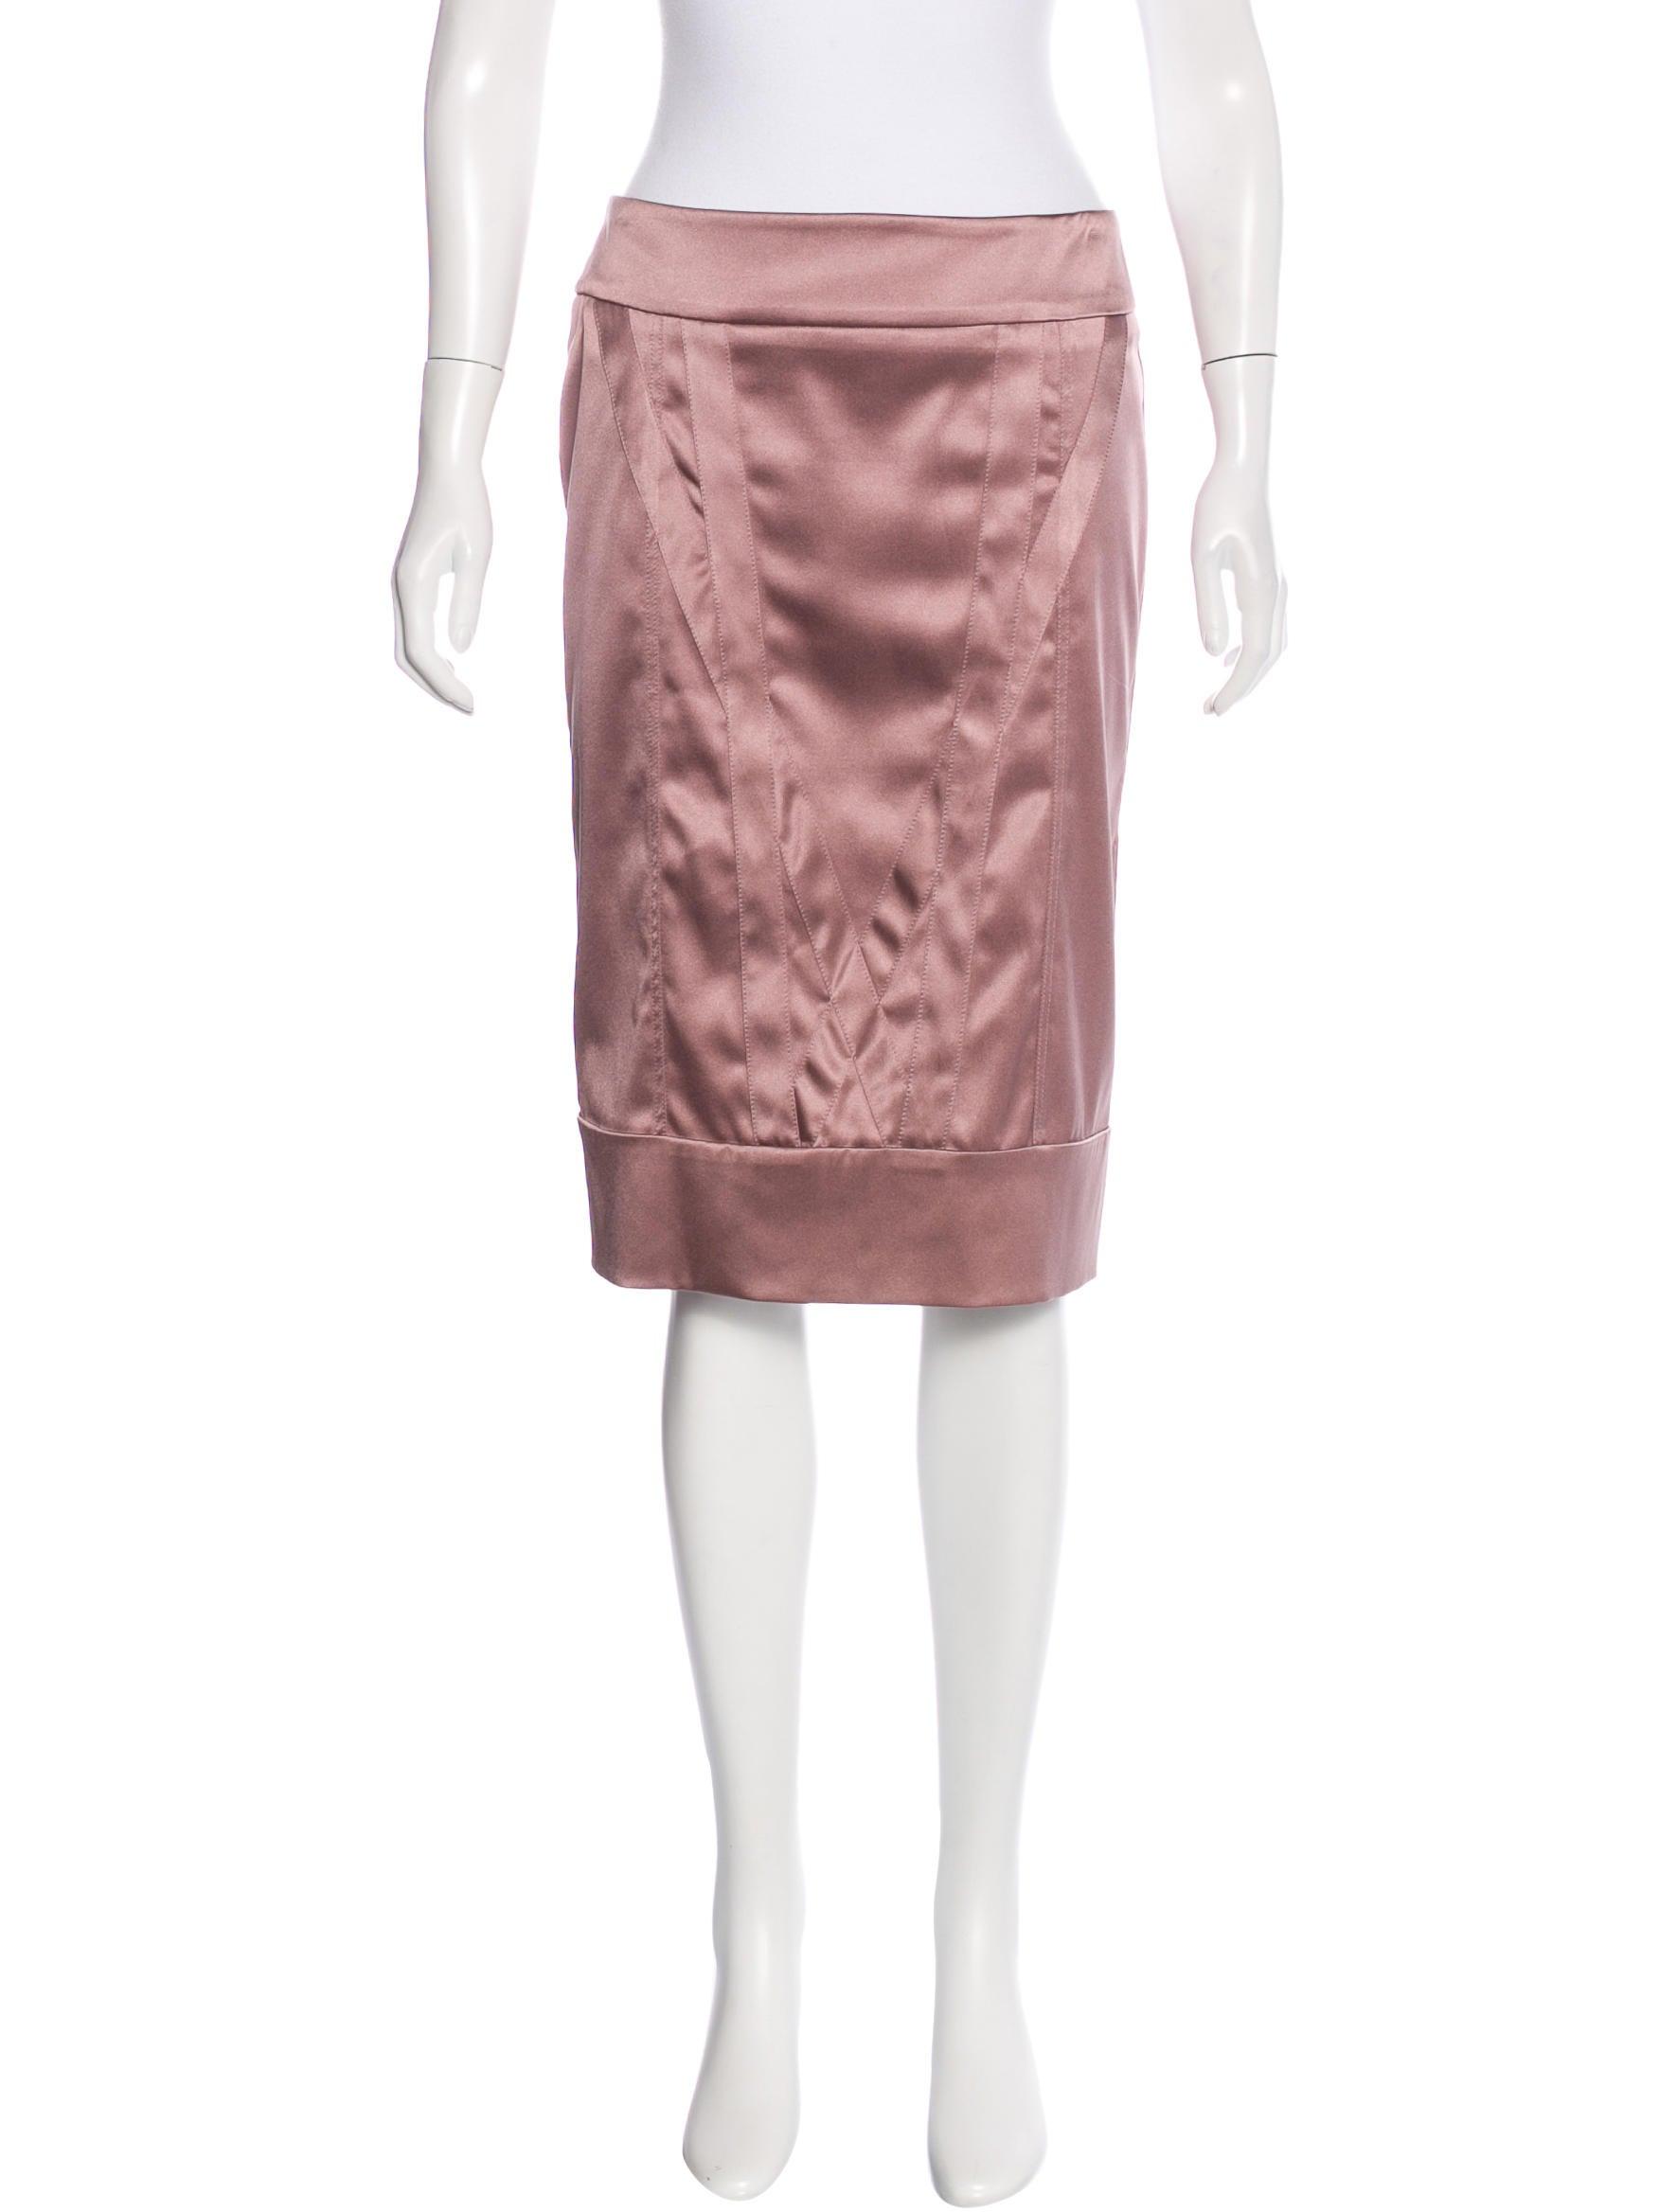 stella mccartney satin pencil skirt clothing stl46078